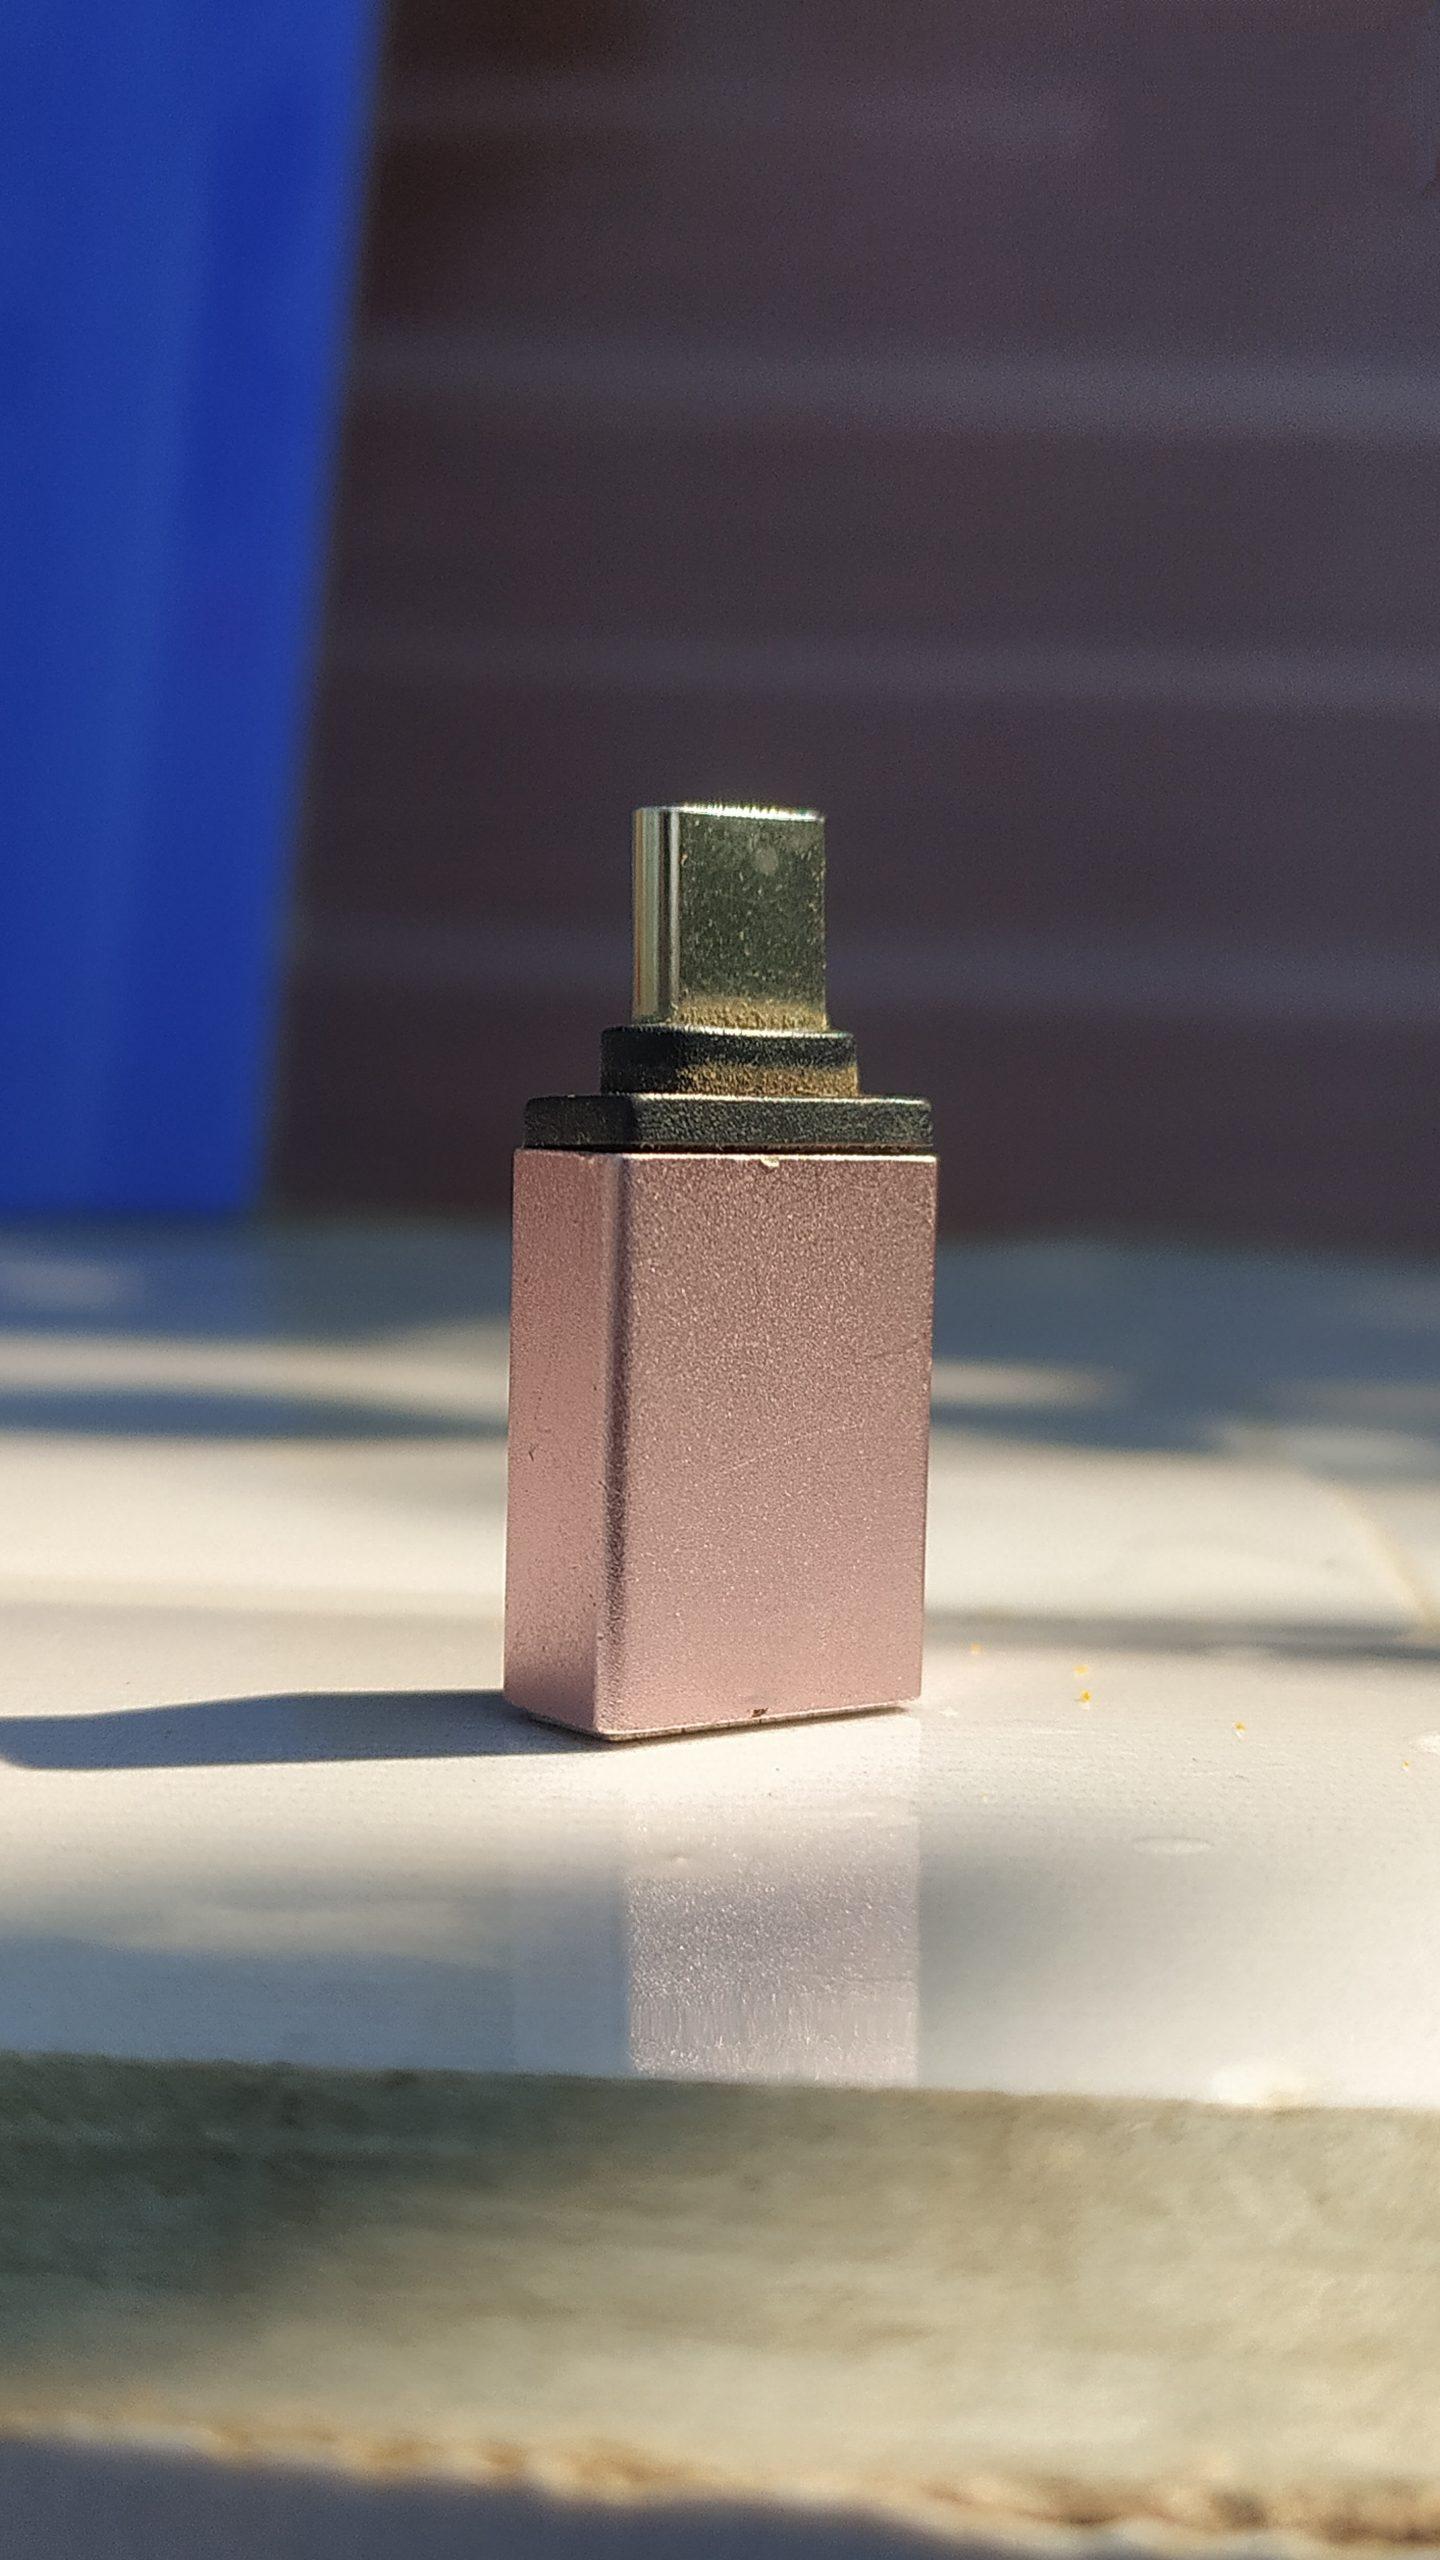 A micro USB to USB